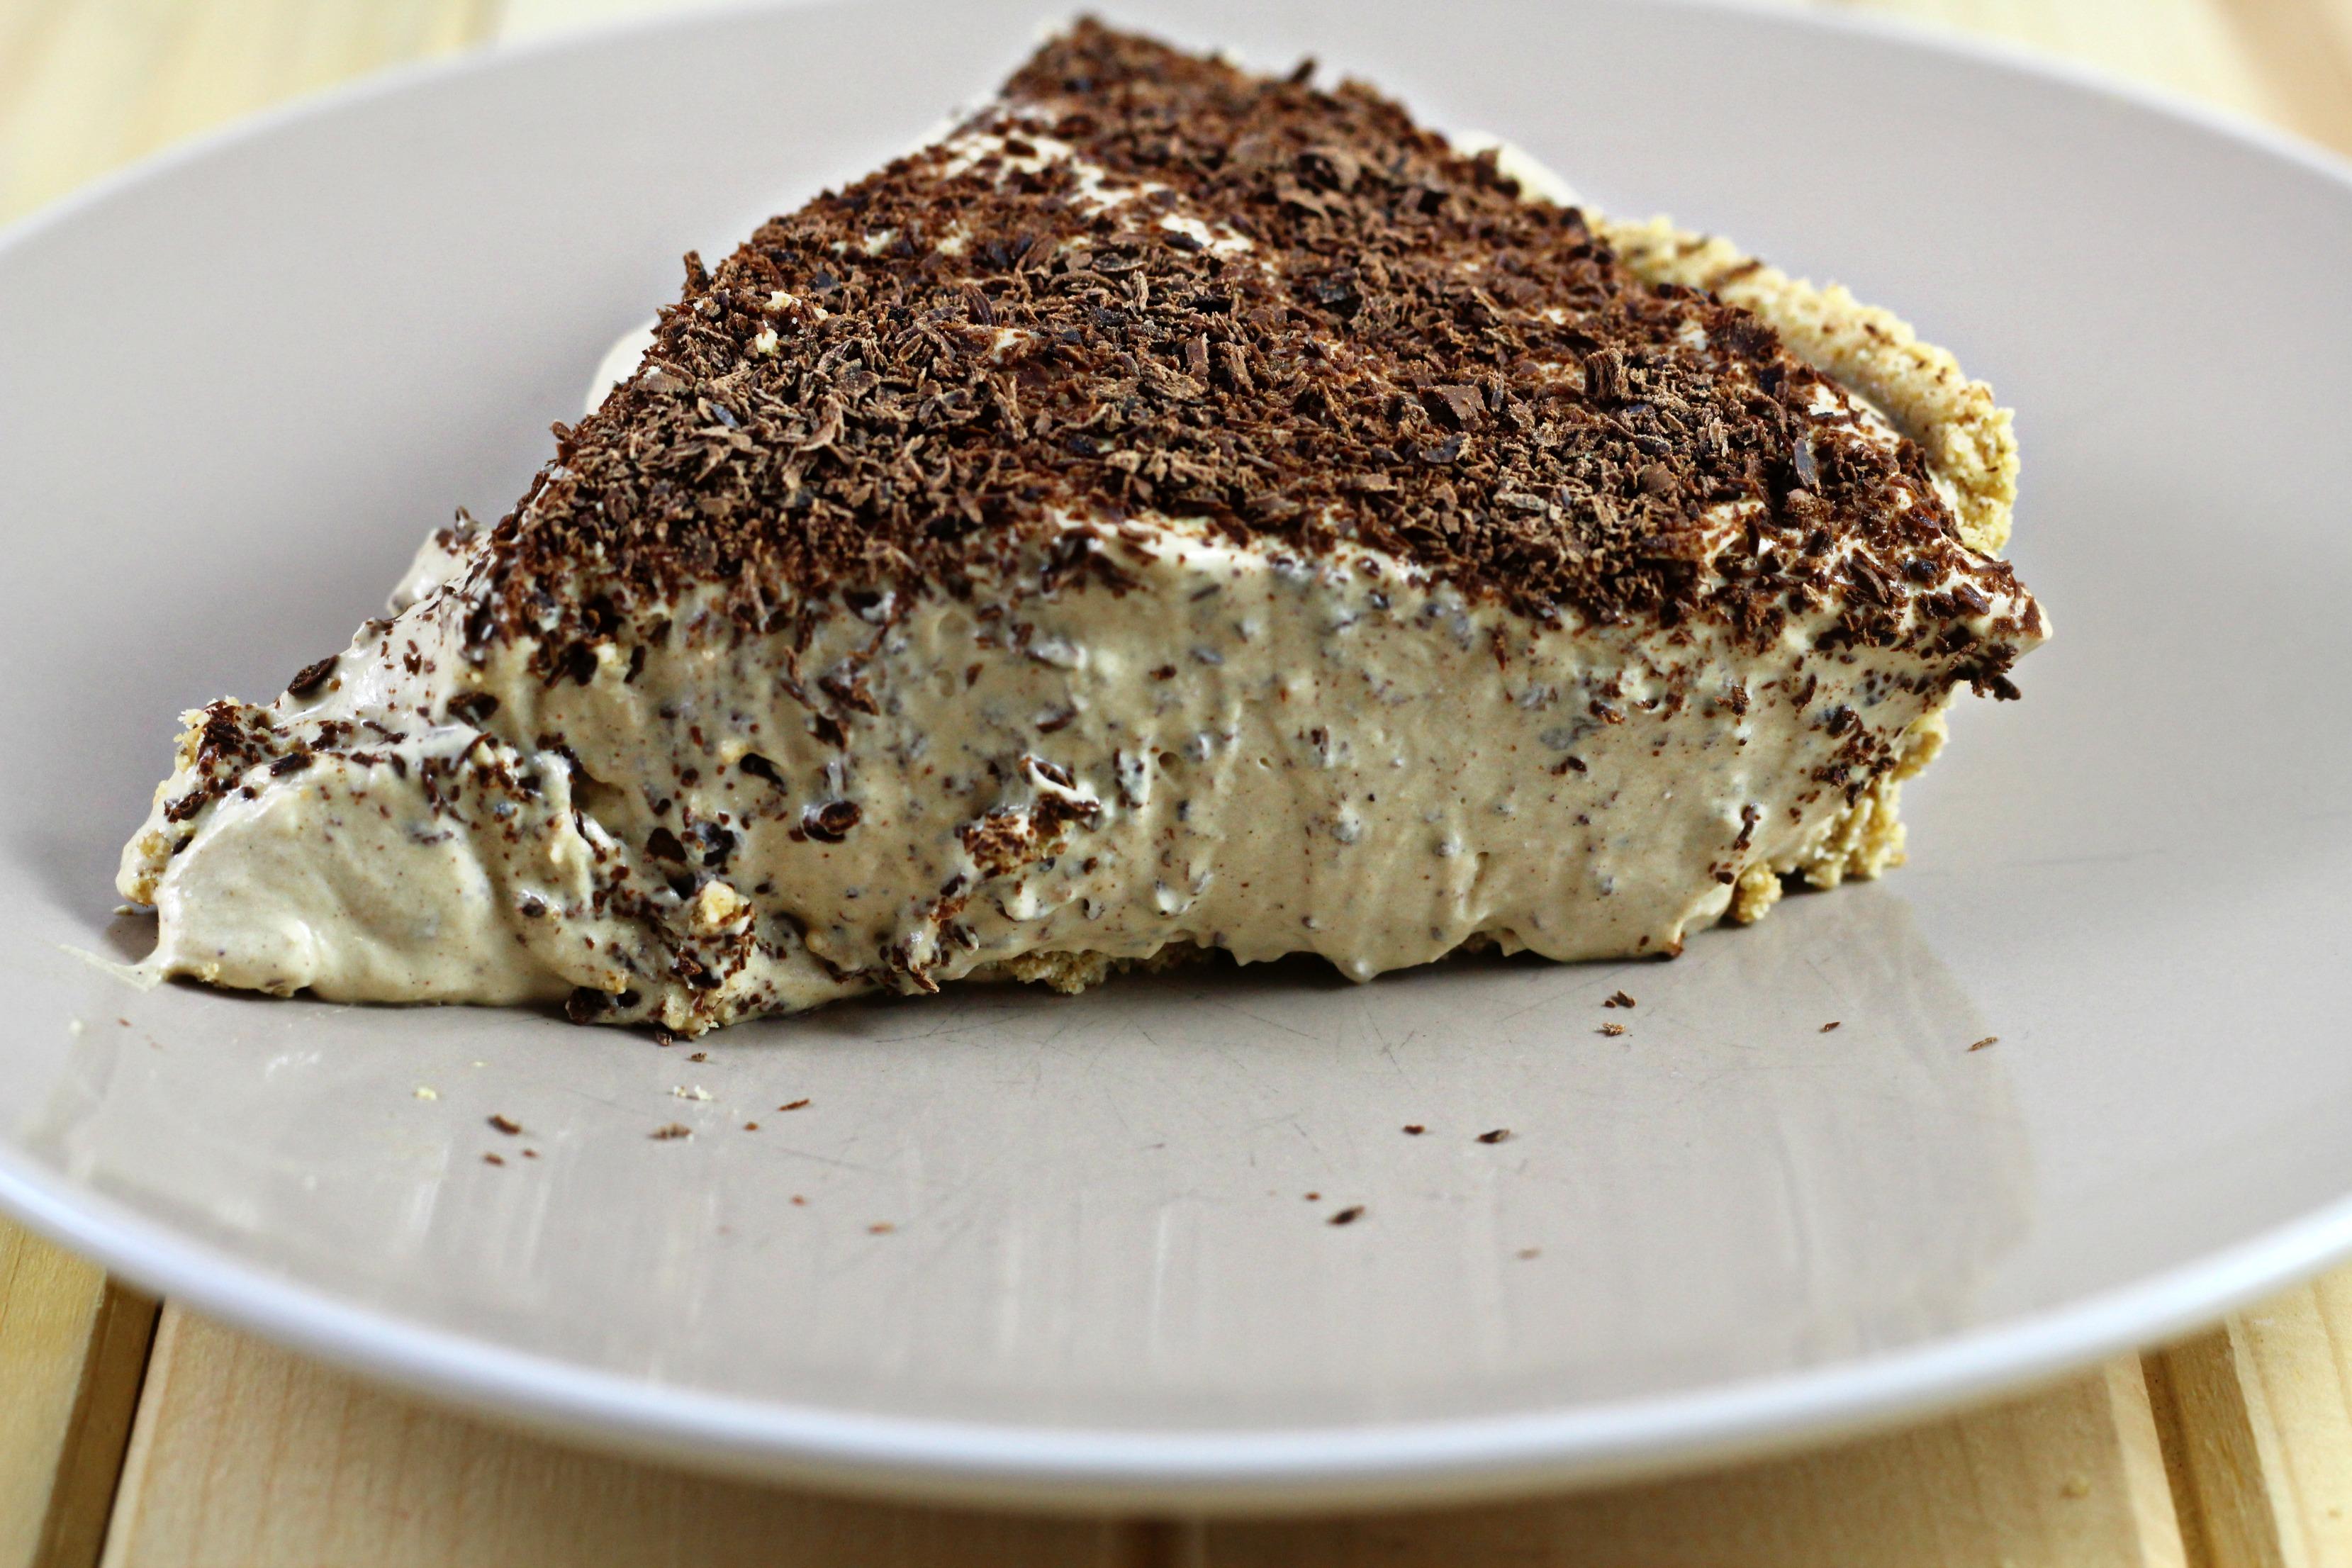 Greek Yogurt No-Bake Cheesecake